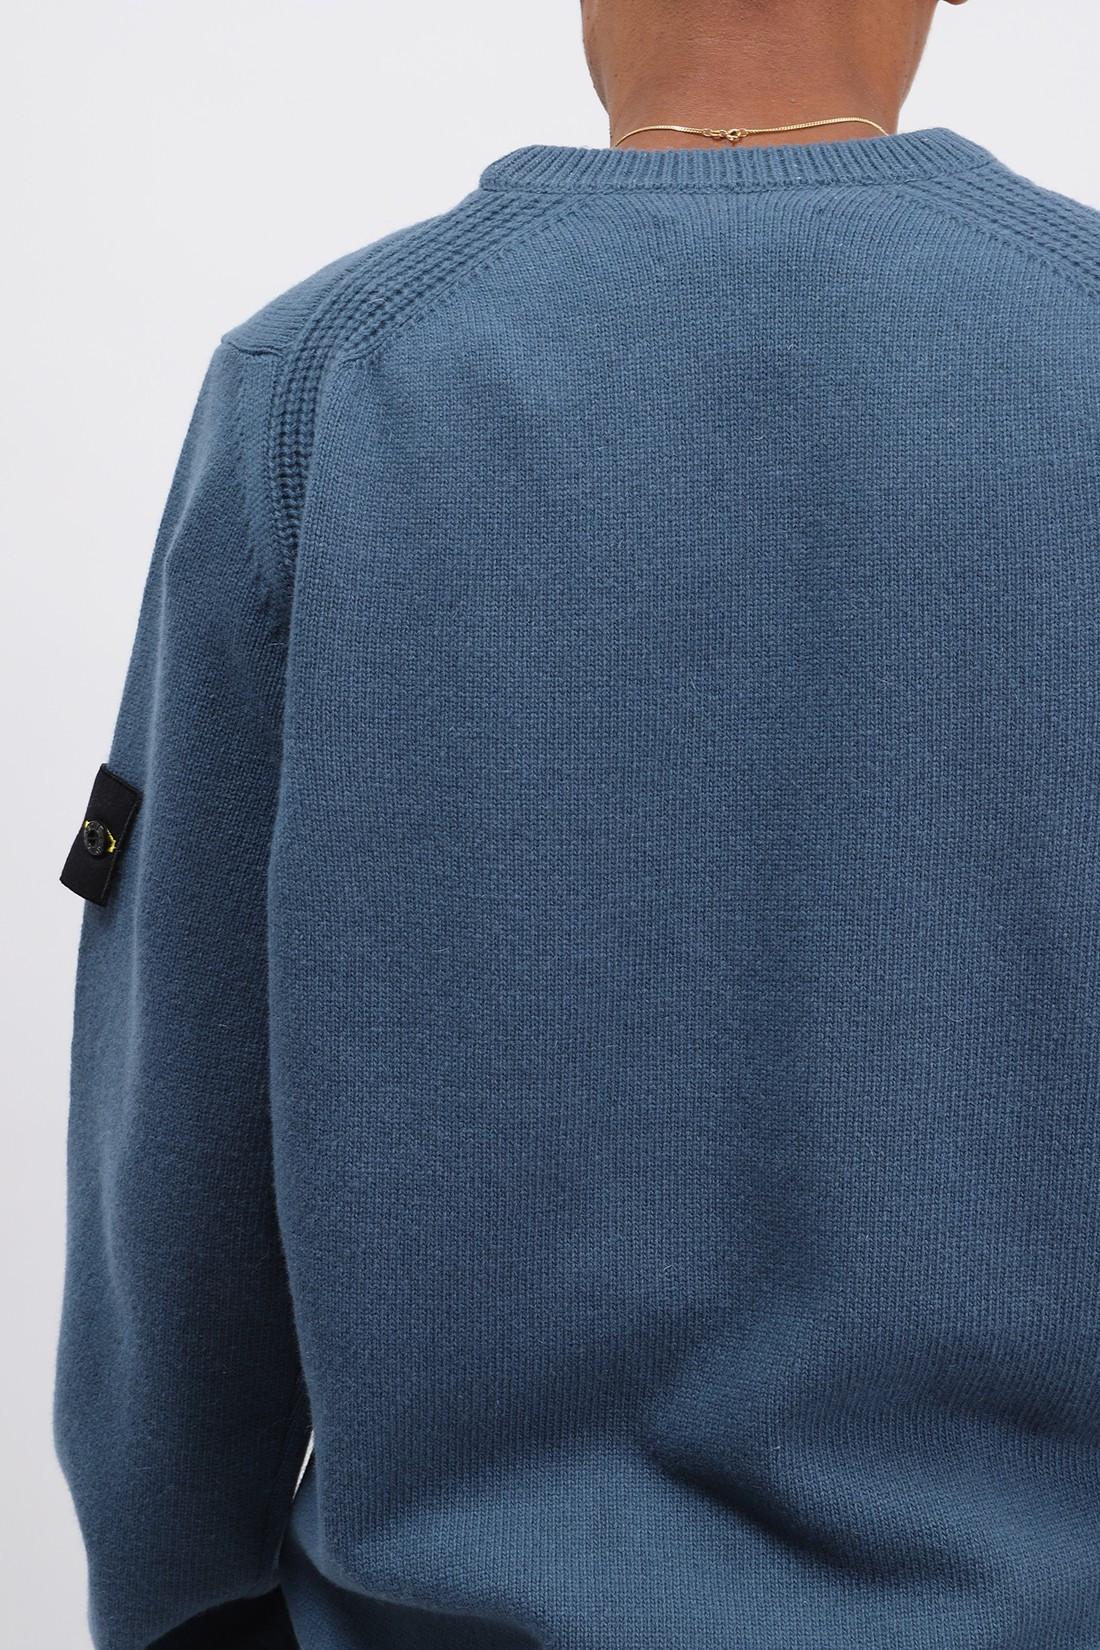 STONE ISLAND / 535a3 classic knit v0023 Ottanio